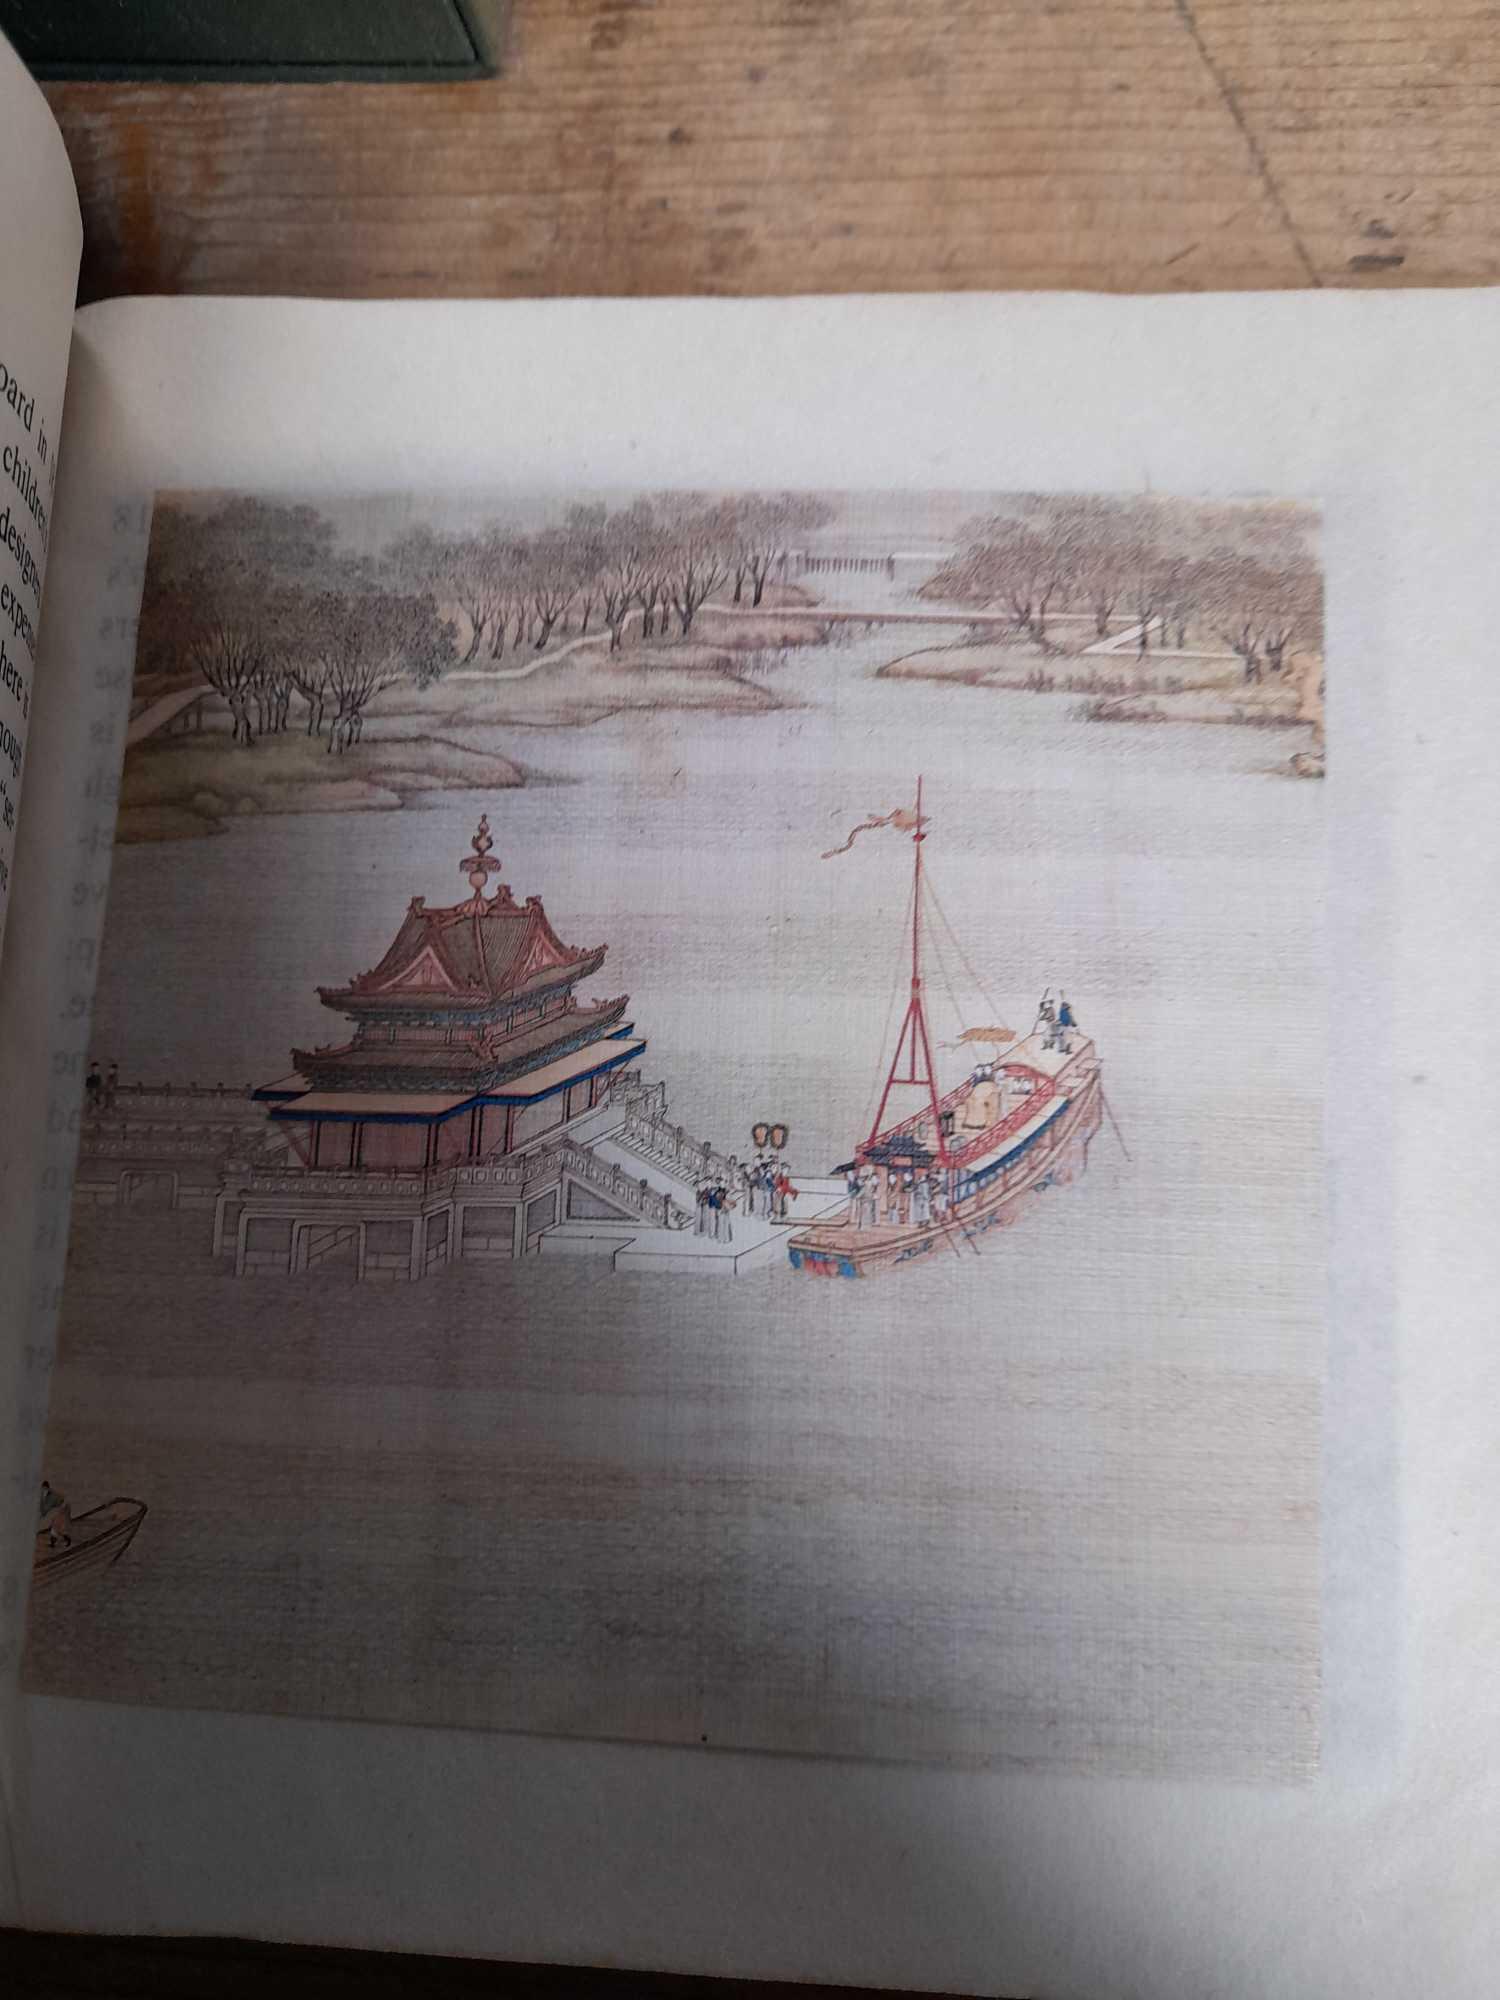 2 ORIENTAL BOOKS - Image 11 of 14